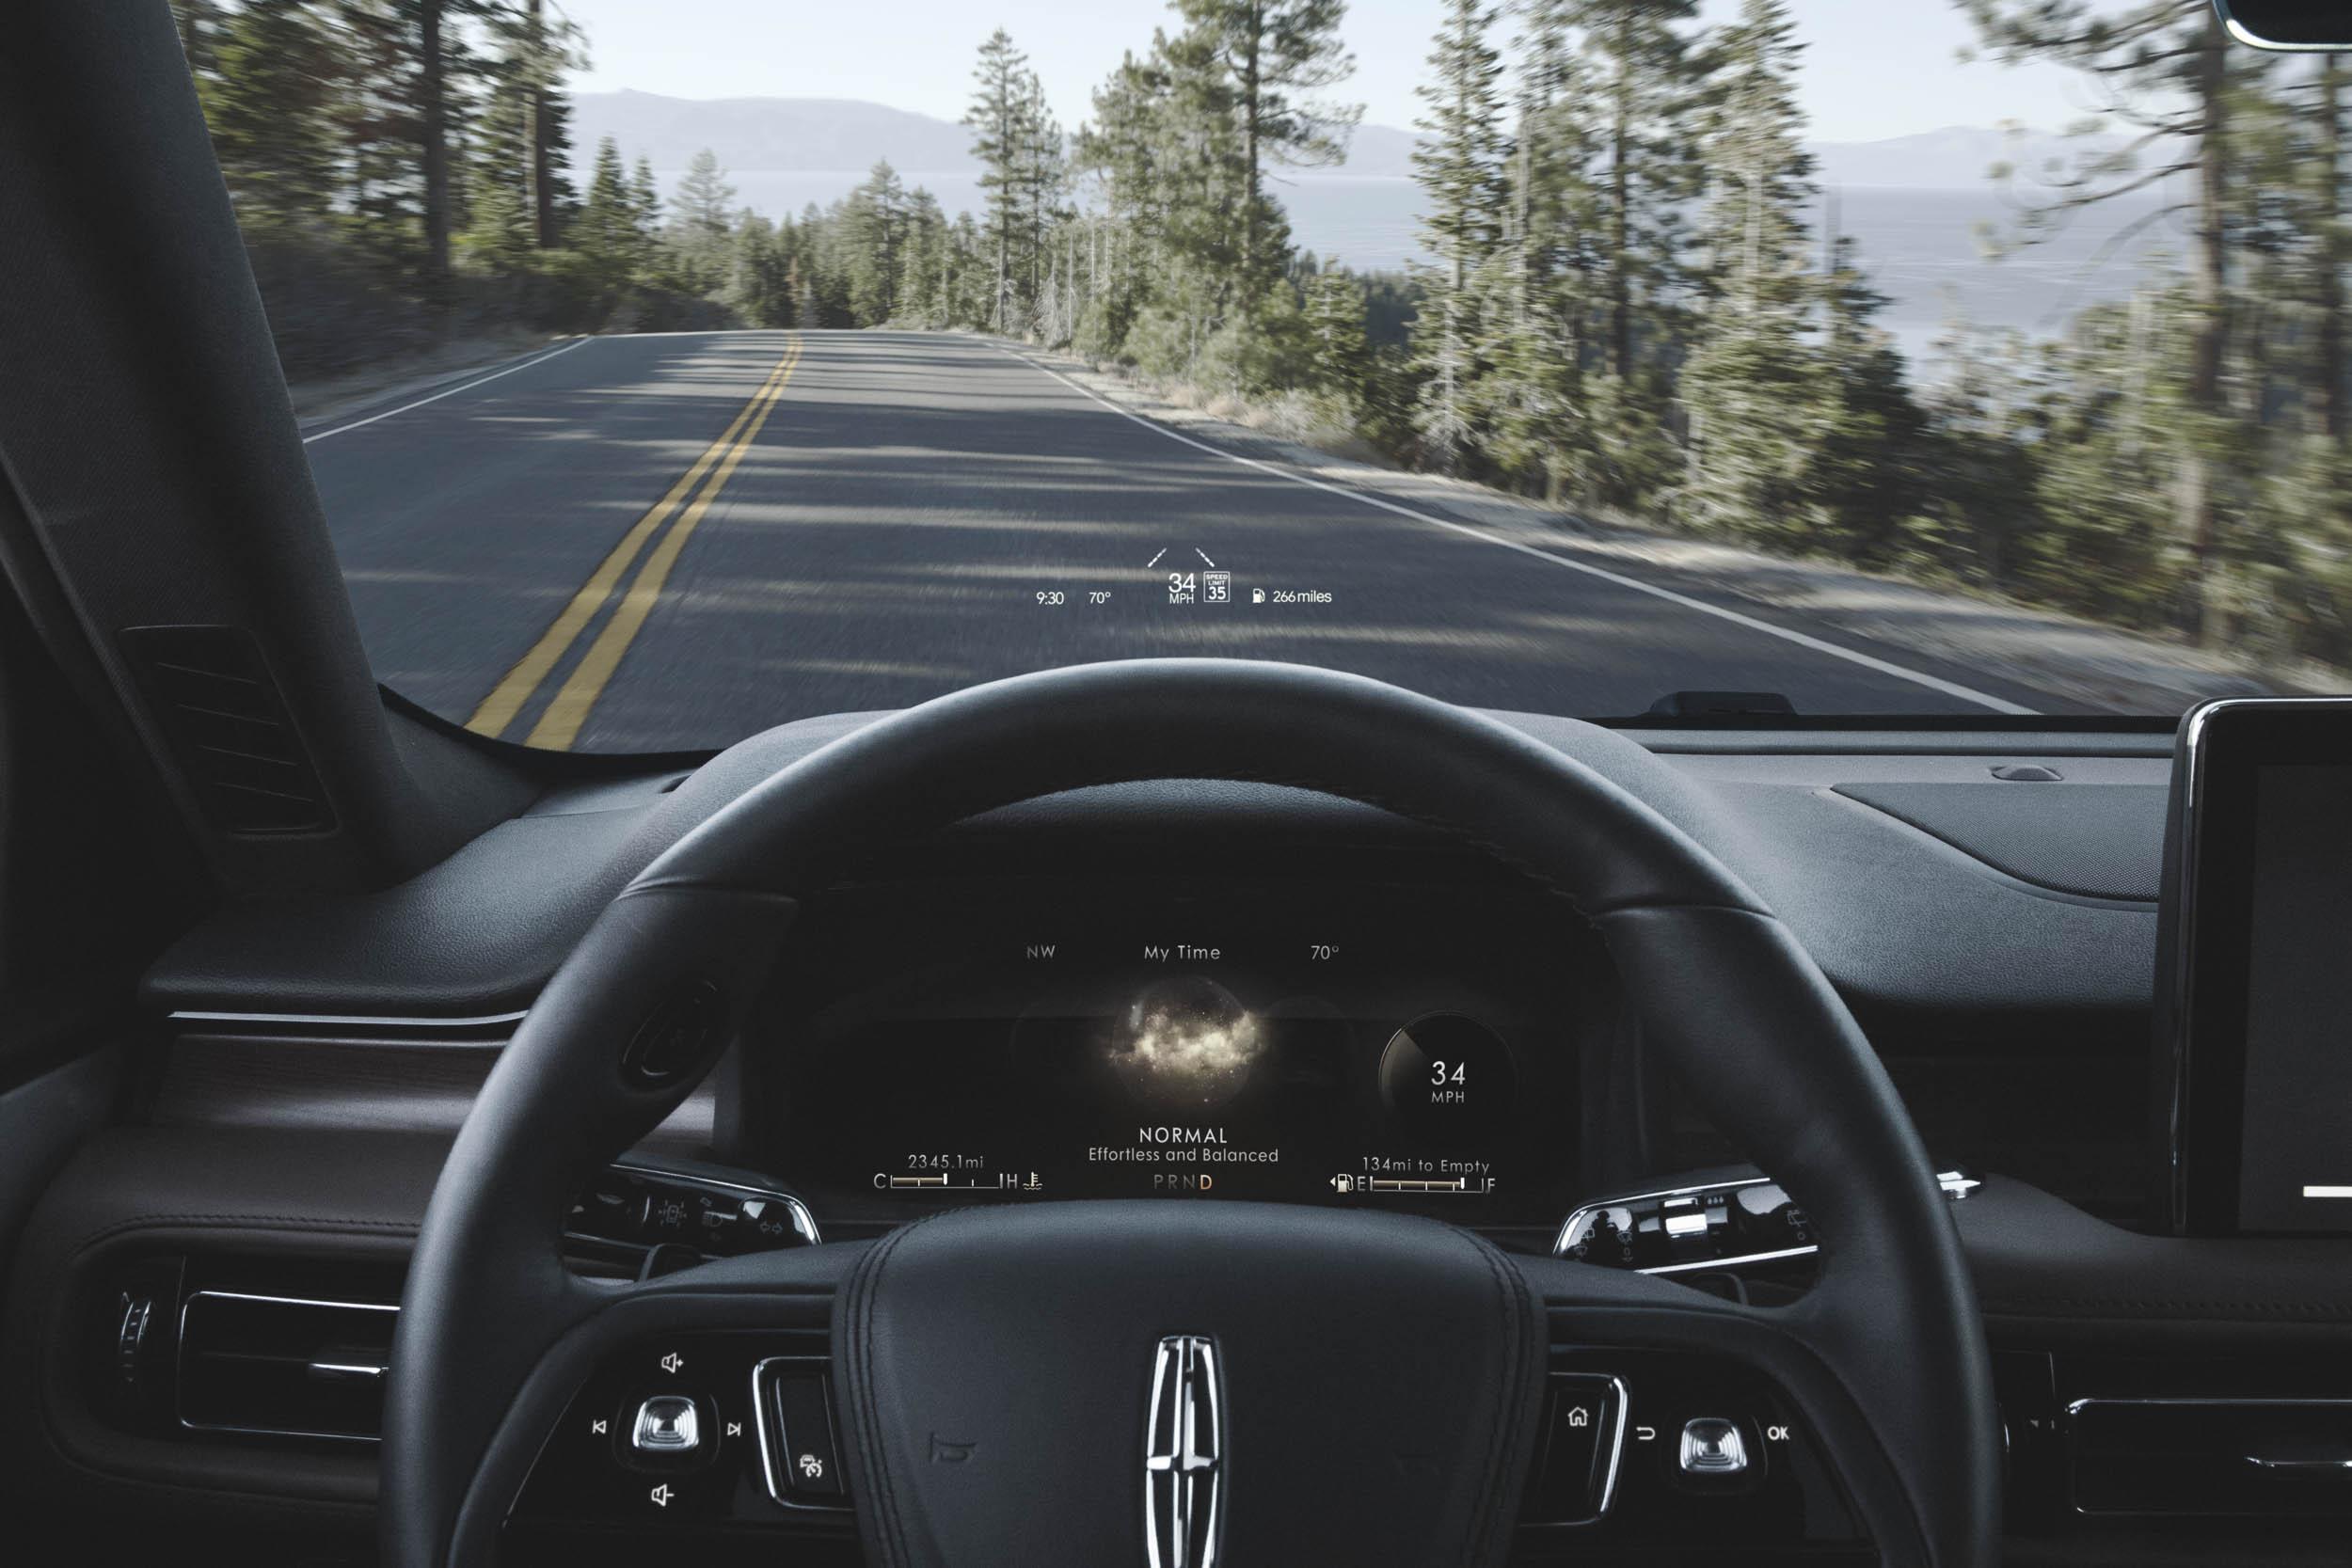 2020 Lincoln Aviator heads up display